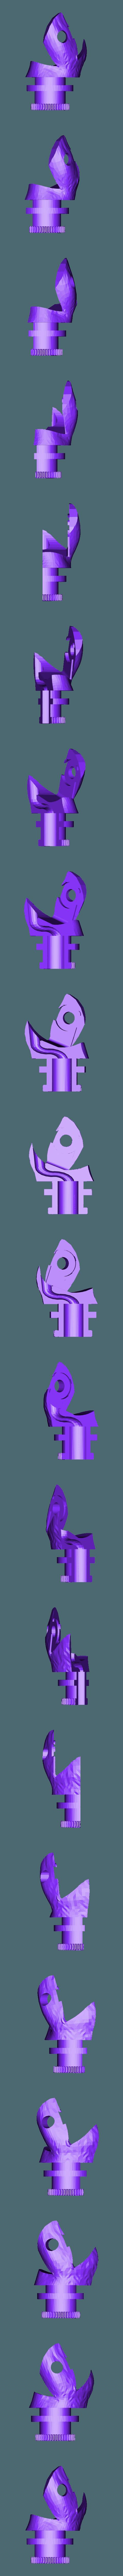 GADGETS left elbow pt1.stl Download free STL file GADGET the robotic Gremlin • 3D printing object, atarka3